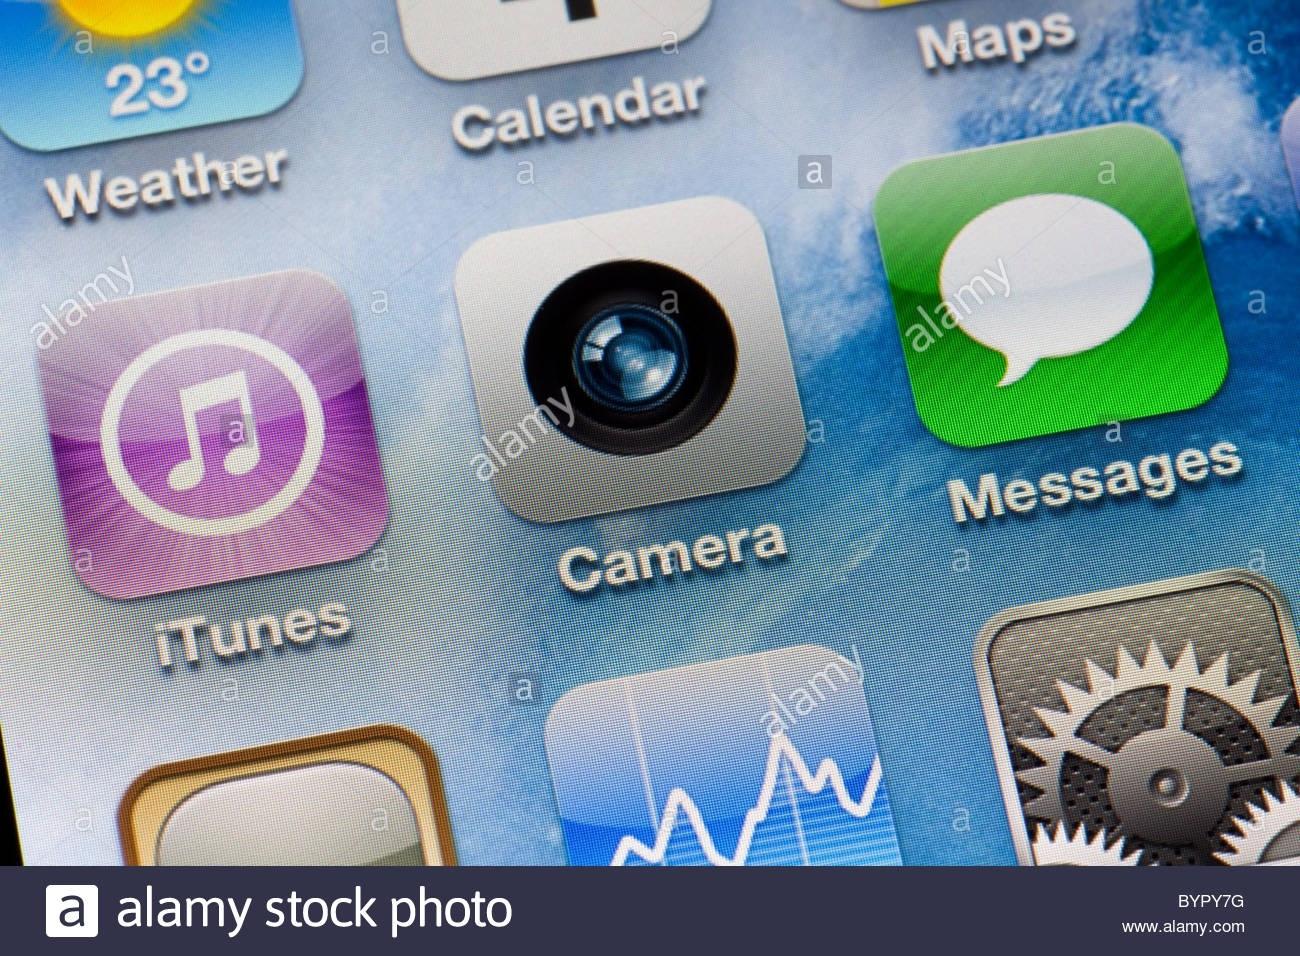 Apple Iphone 4 Ipod Icons Close Up Screen Camera Stock Photo_Iphone 4 Calendar Icon